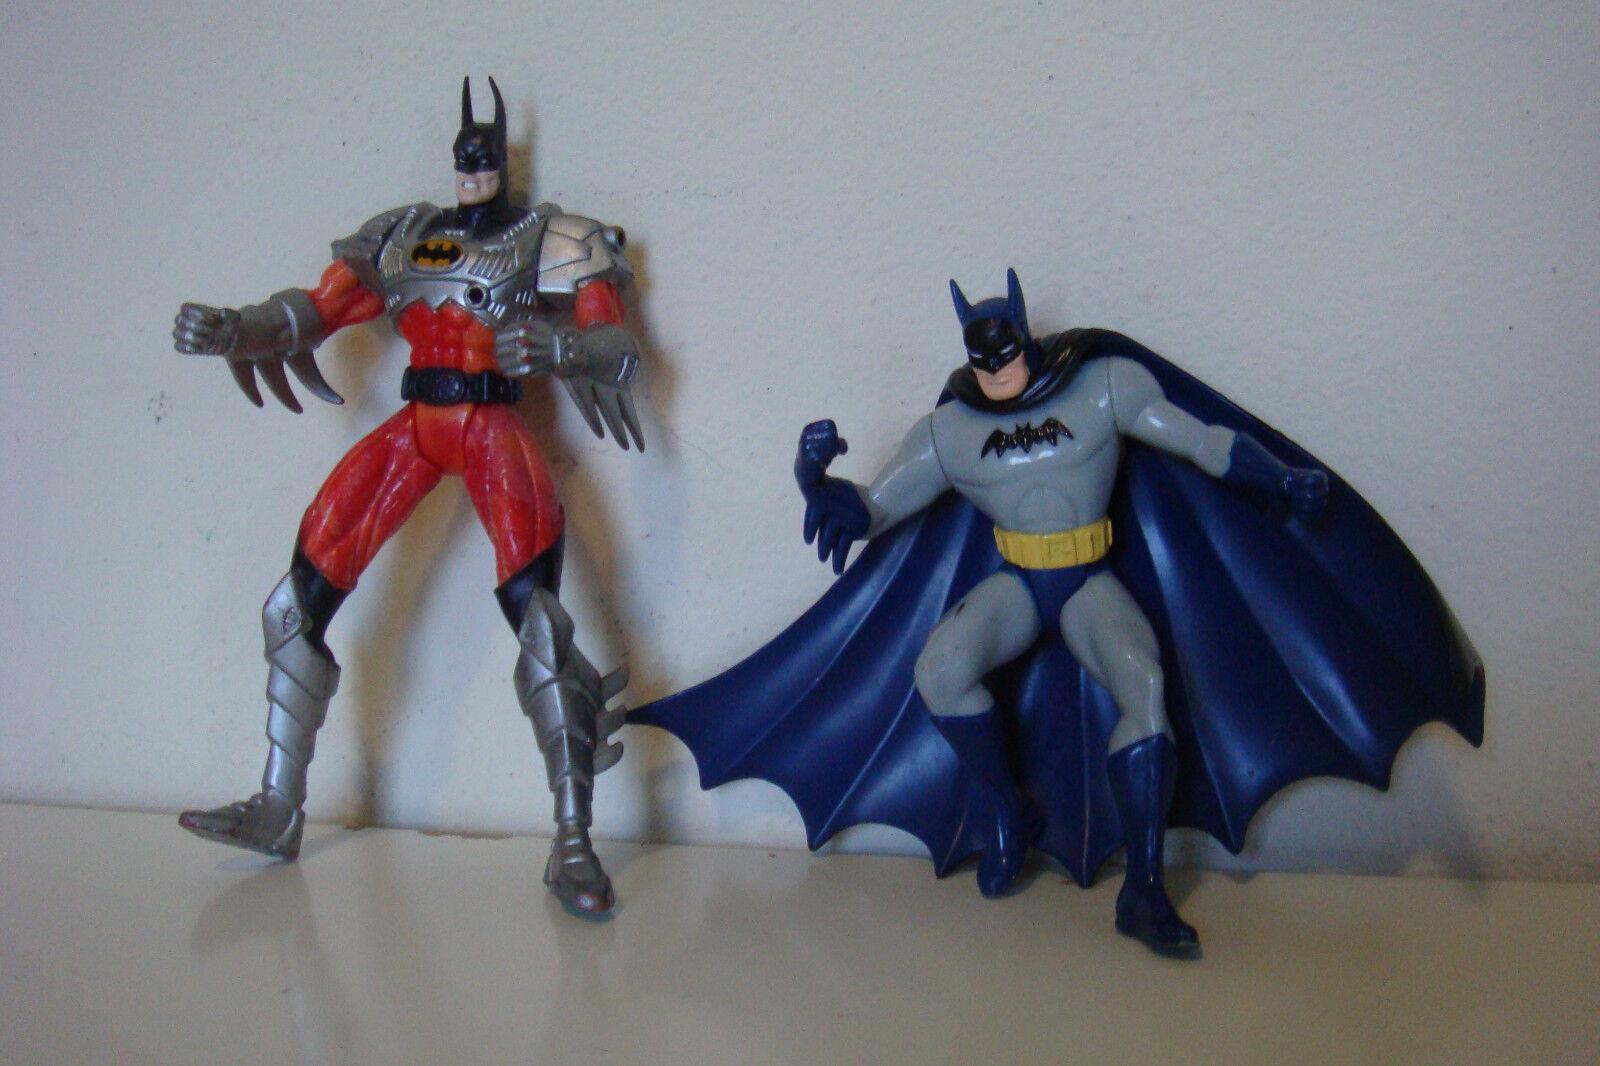 LOT OF 2 VINTAGE BATMAN @1998 DC COMICS FIGURES 6-1 4 INCH & 5-1 4 INCH TALL